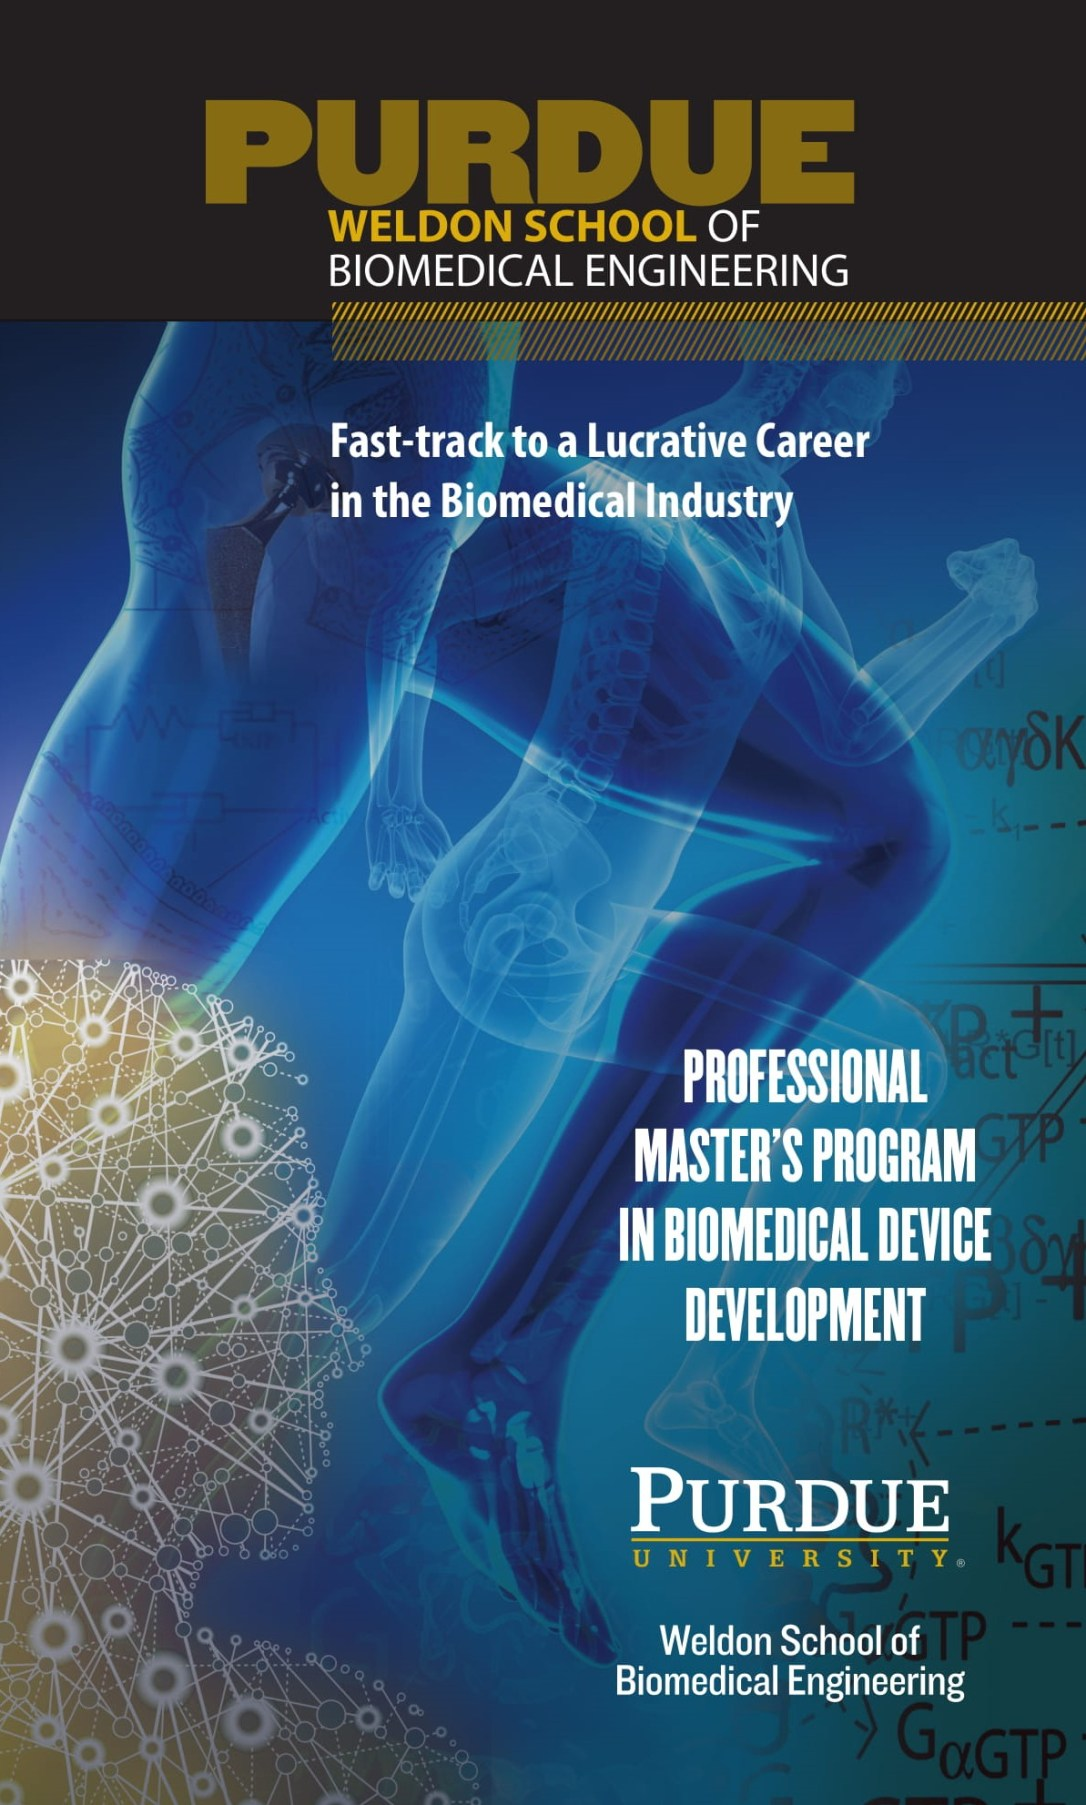 ENGS-18-11359 BME Masters Program Brochure SPLIT 01